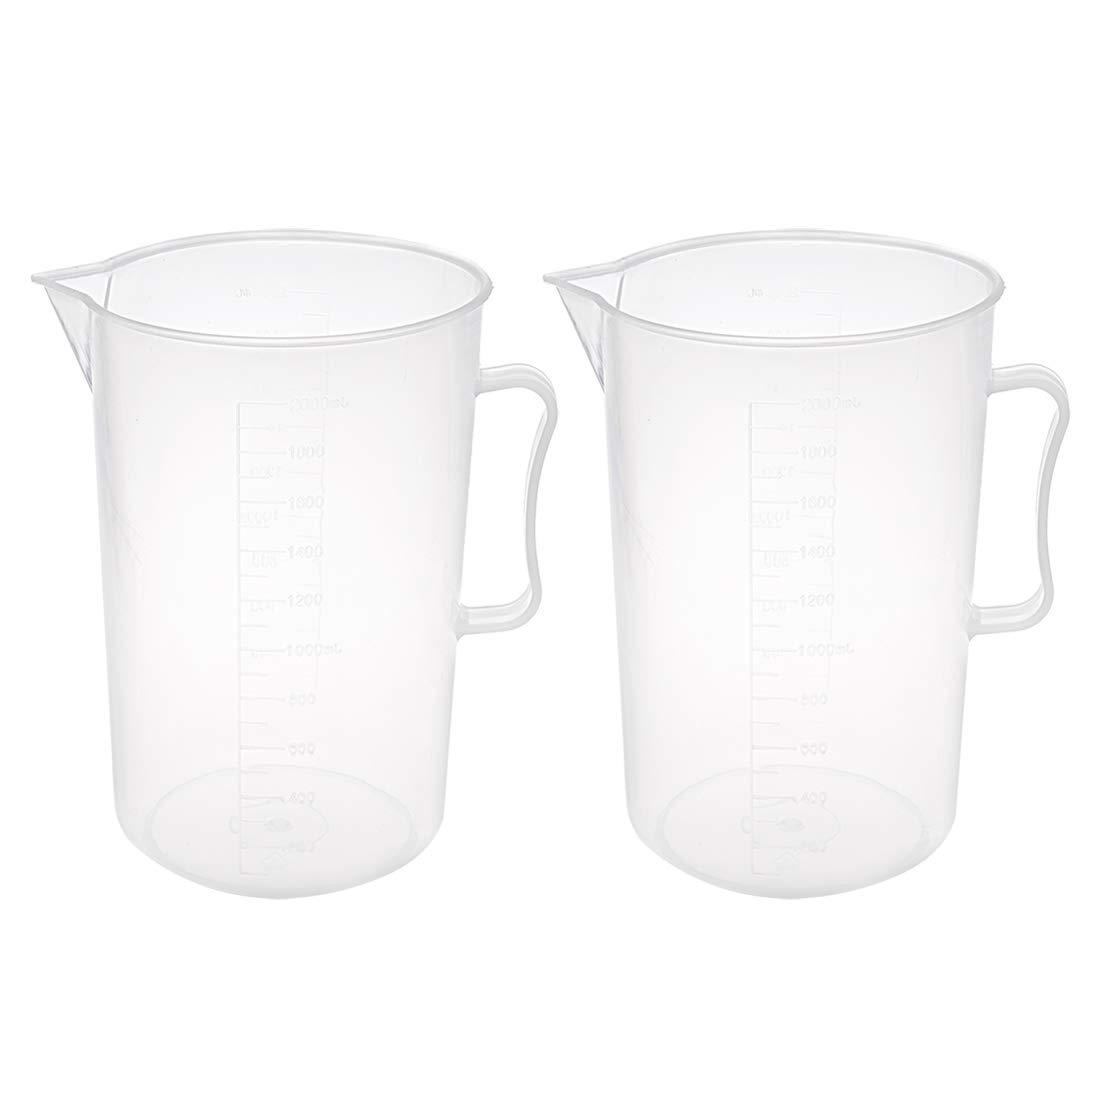 uxcell 9pcs Measuring Cups Set Kitchen Laboratory Plastic Liquid Water Measuring Cup Beaker Mug a17120600ux0308